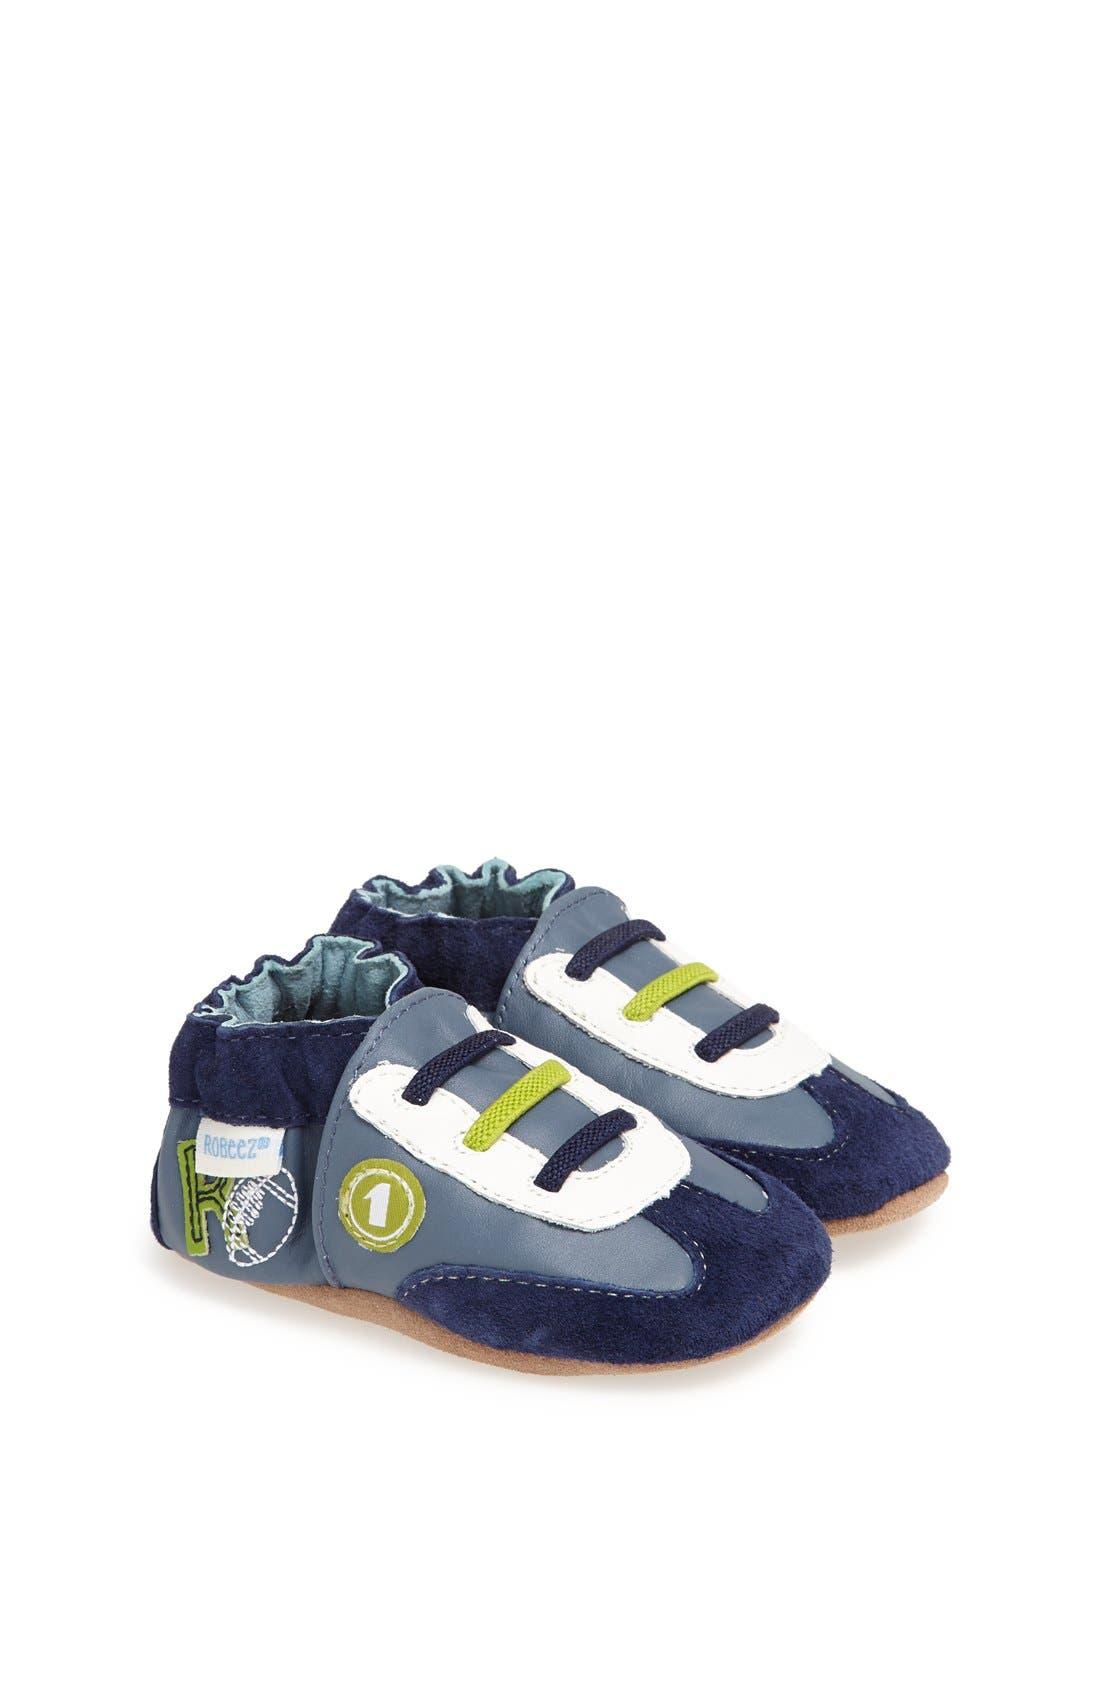 Main Image - Robeez® 'All Star Rodney' Crib Shoe (Baby & Walker)